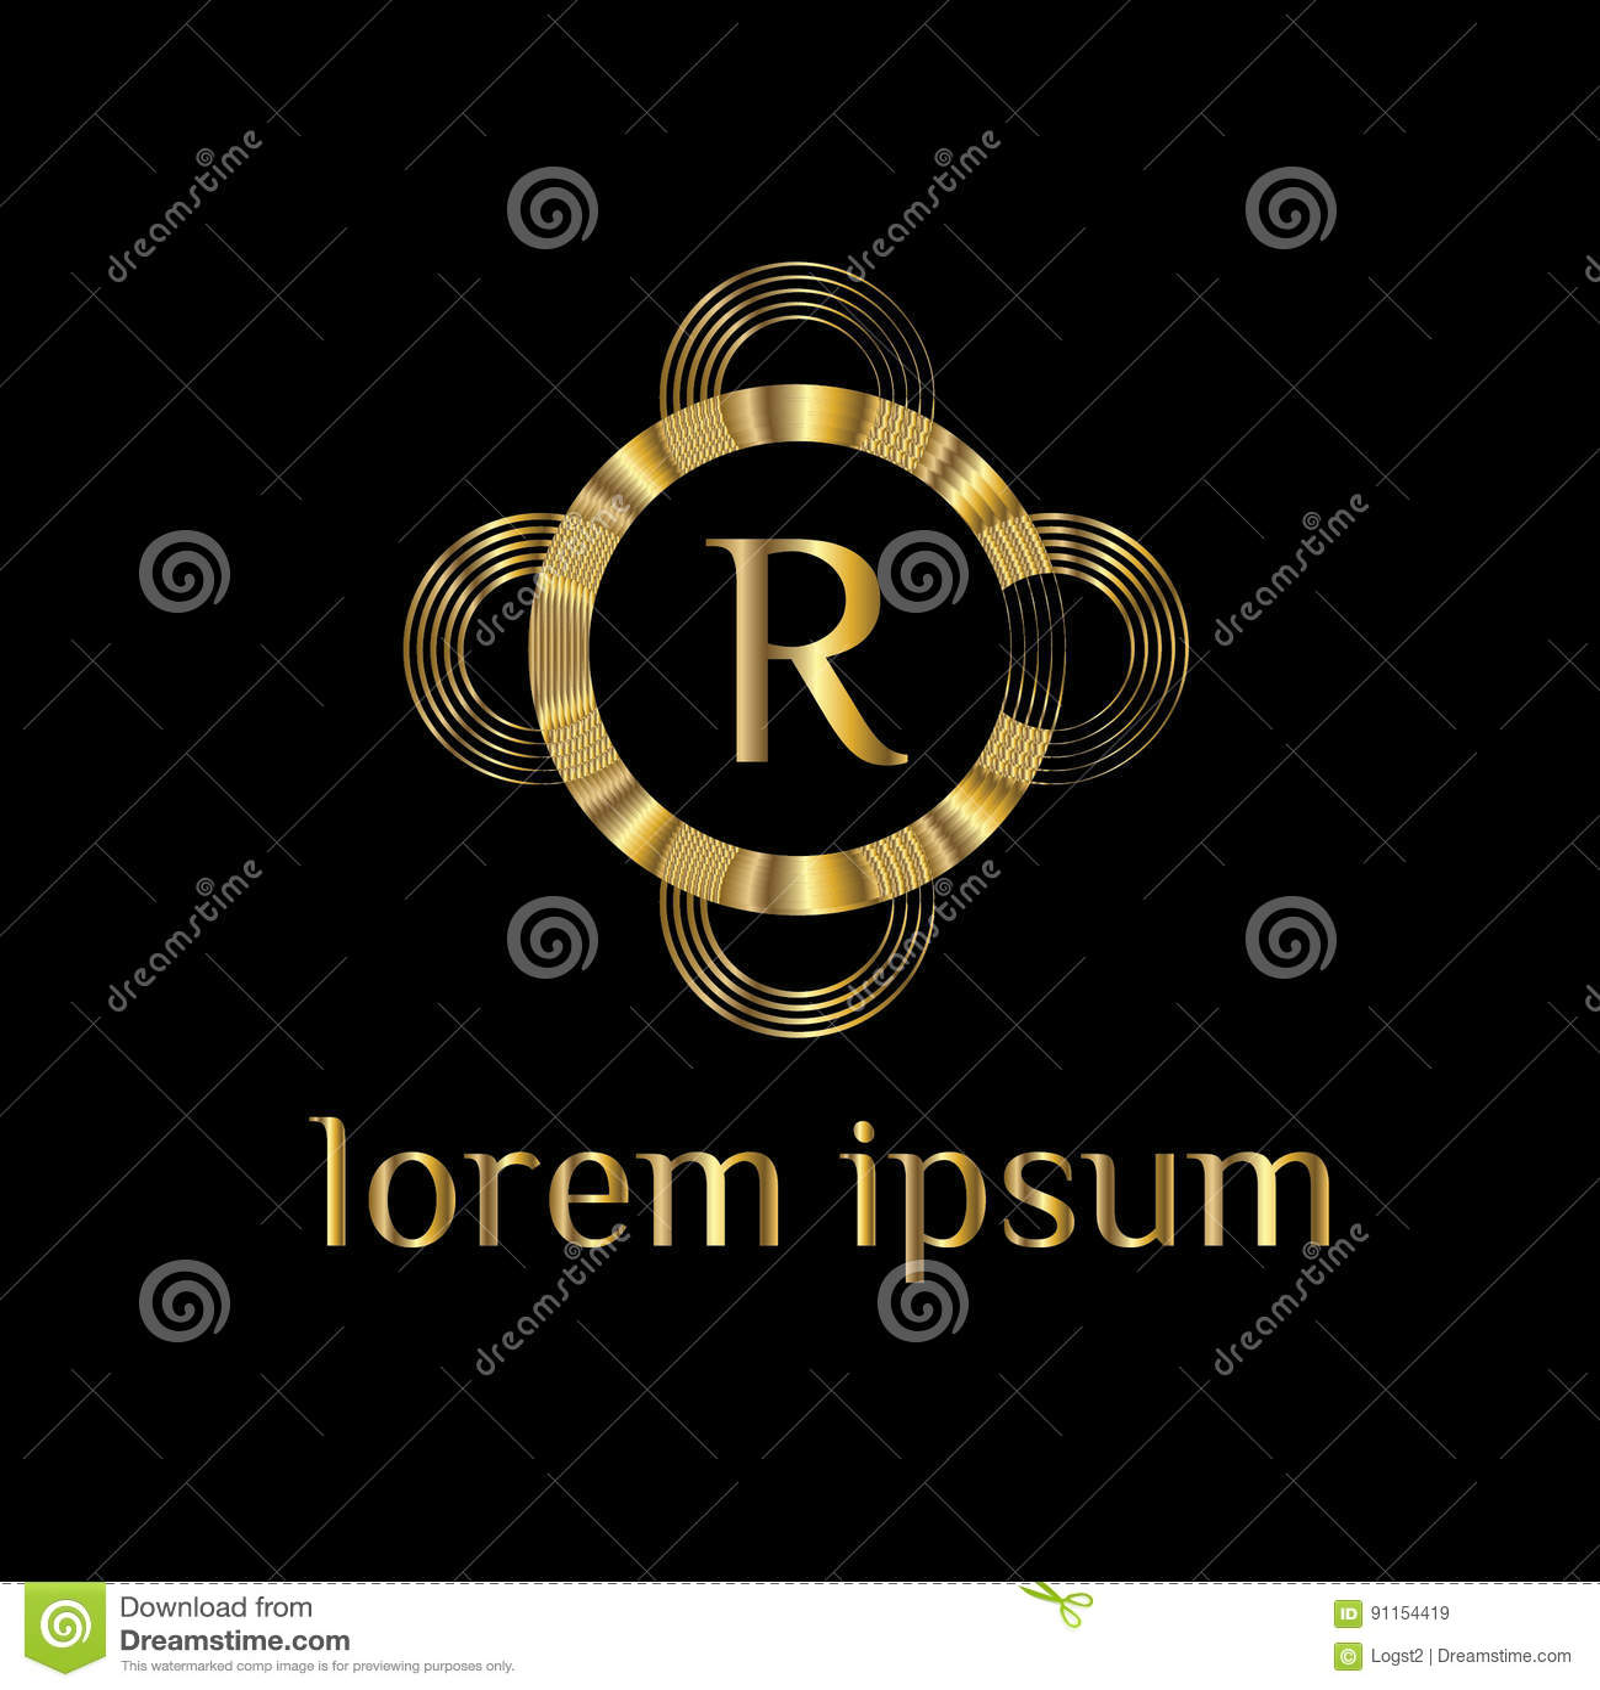 Luxury letter R Logo  Vector logo template sign  symbol  icon  vector  luxury frame. Luxury Letter R Logo  Vector Logo Template Sign  Symbol  Icon